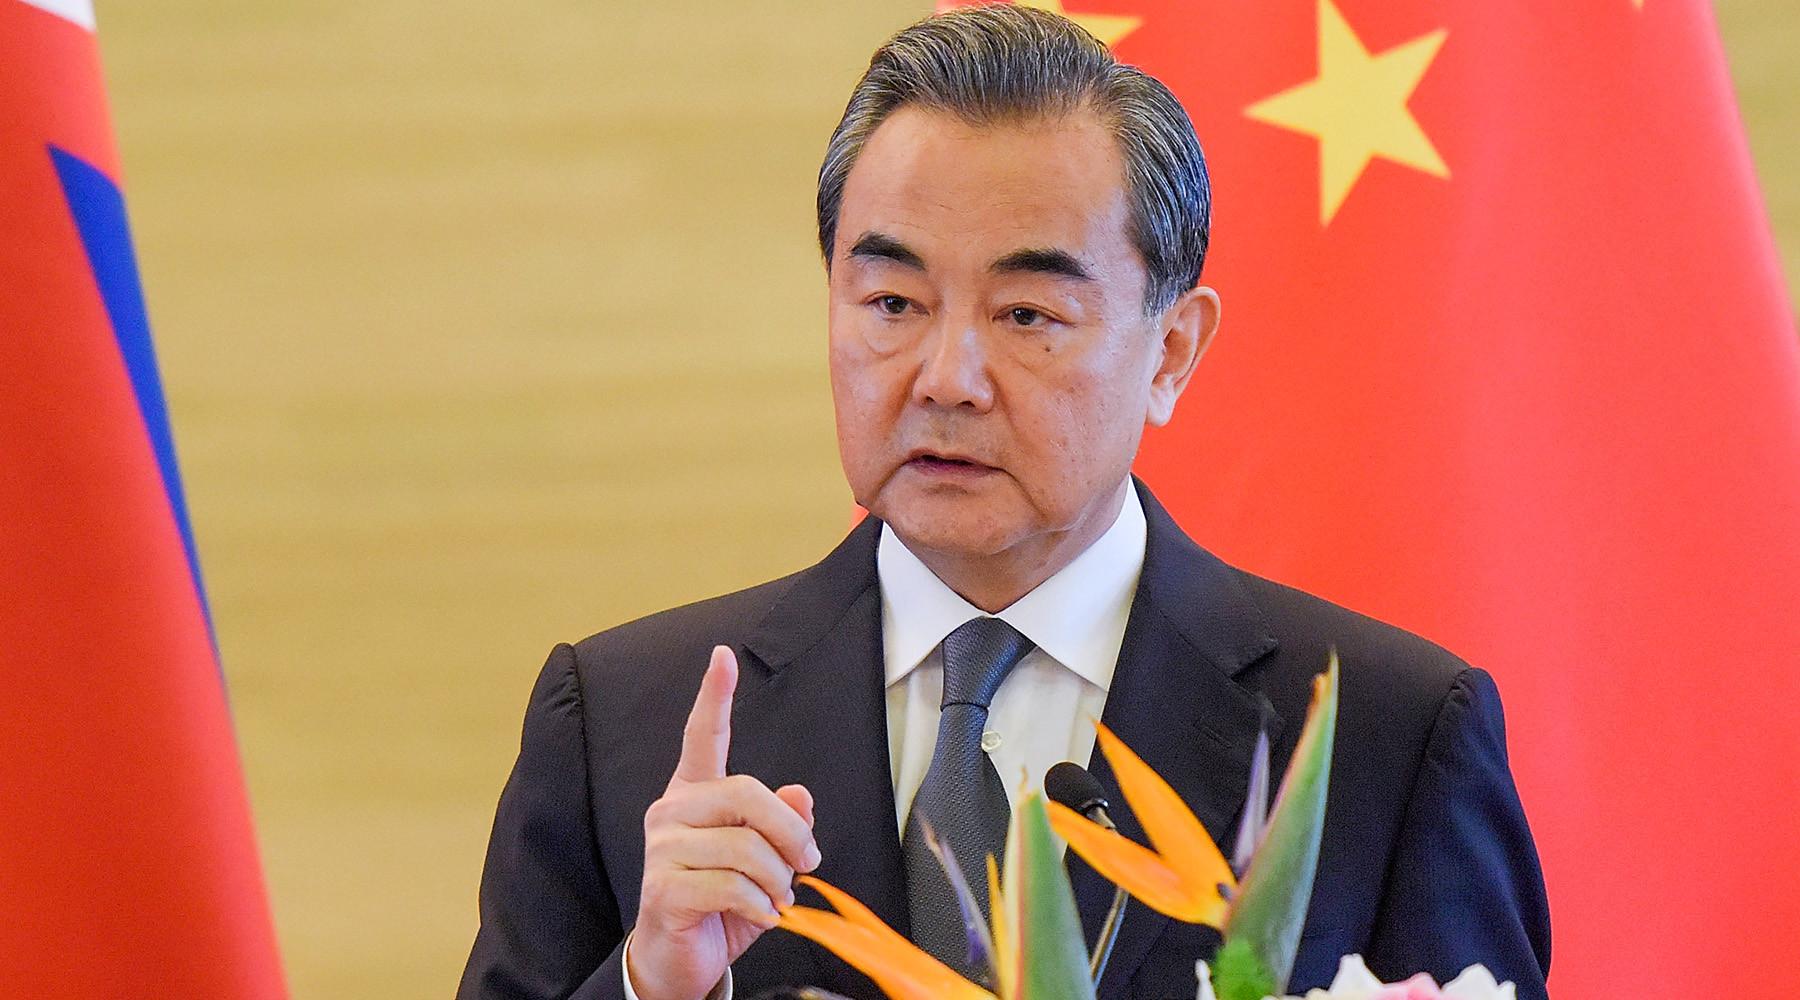 Почему США предлагают снять санкции против КНДР